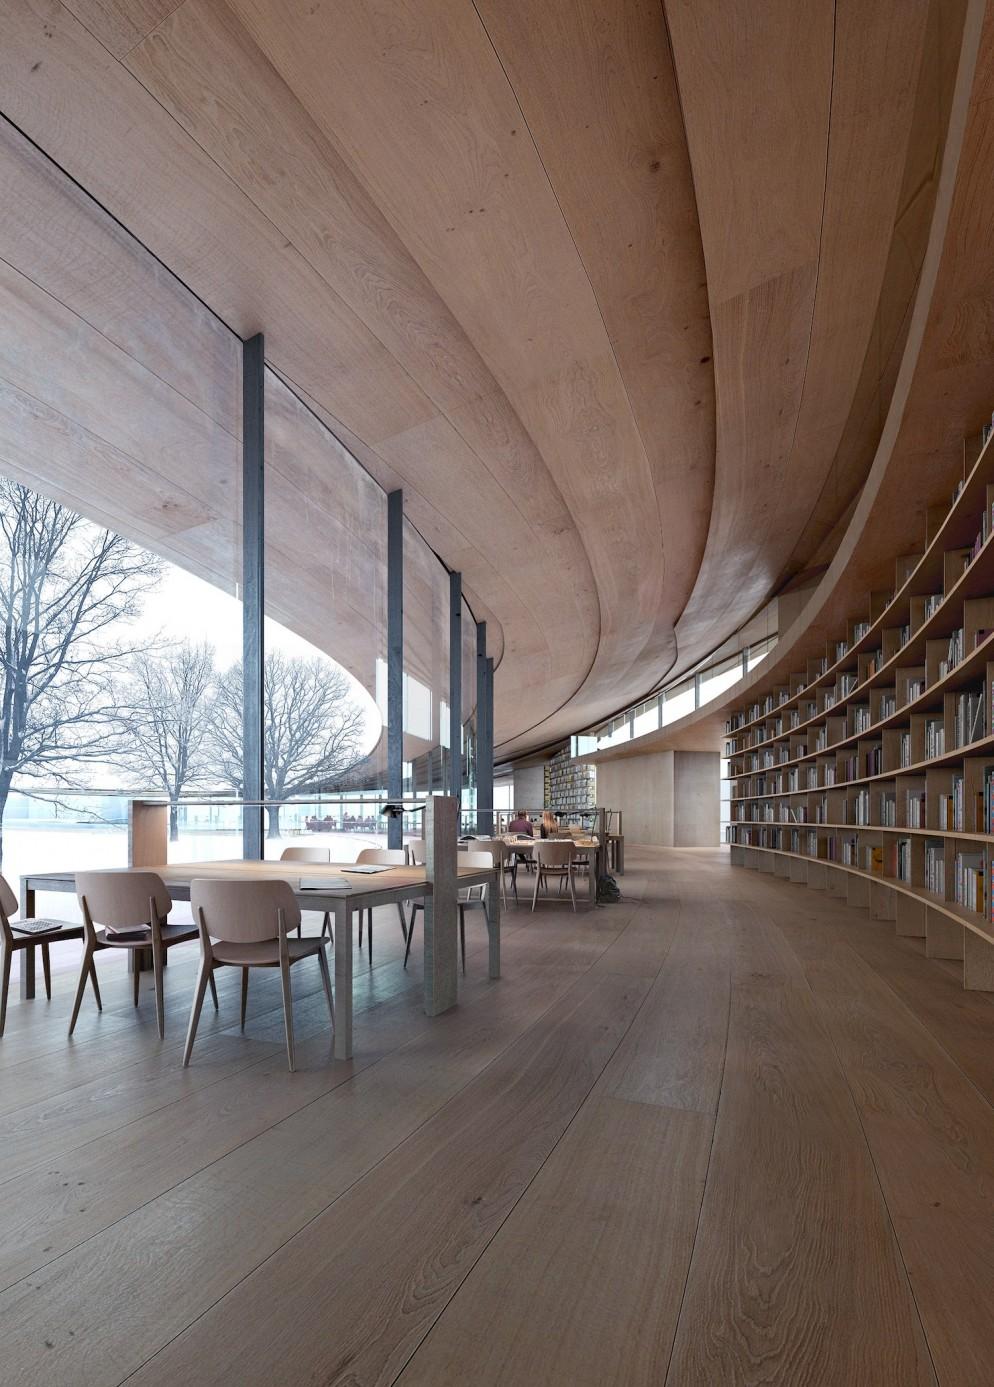 kengo-kuma-ibsen-library-norway-living-corriere-7-min